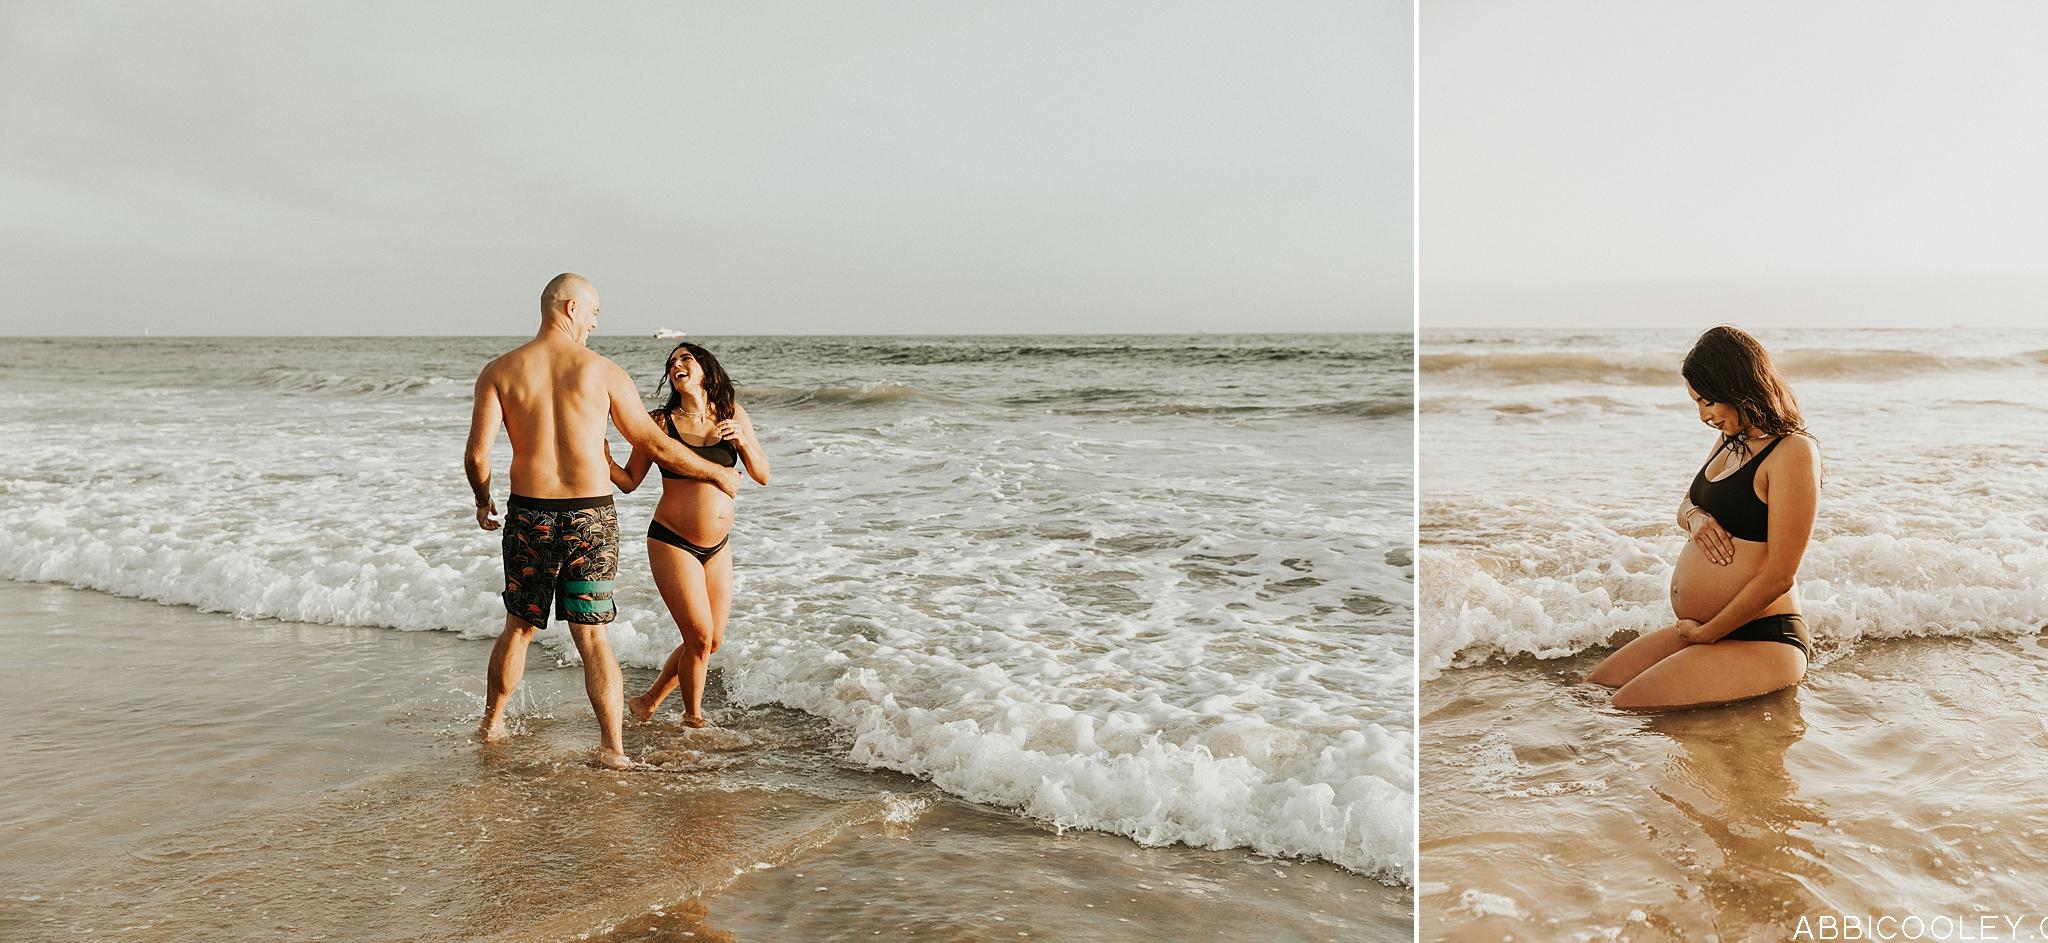 Bikini Maternity Photos Newport Beach